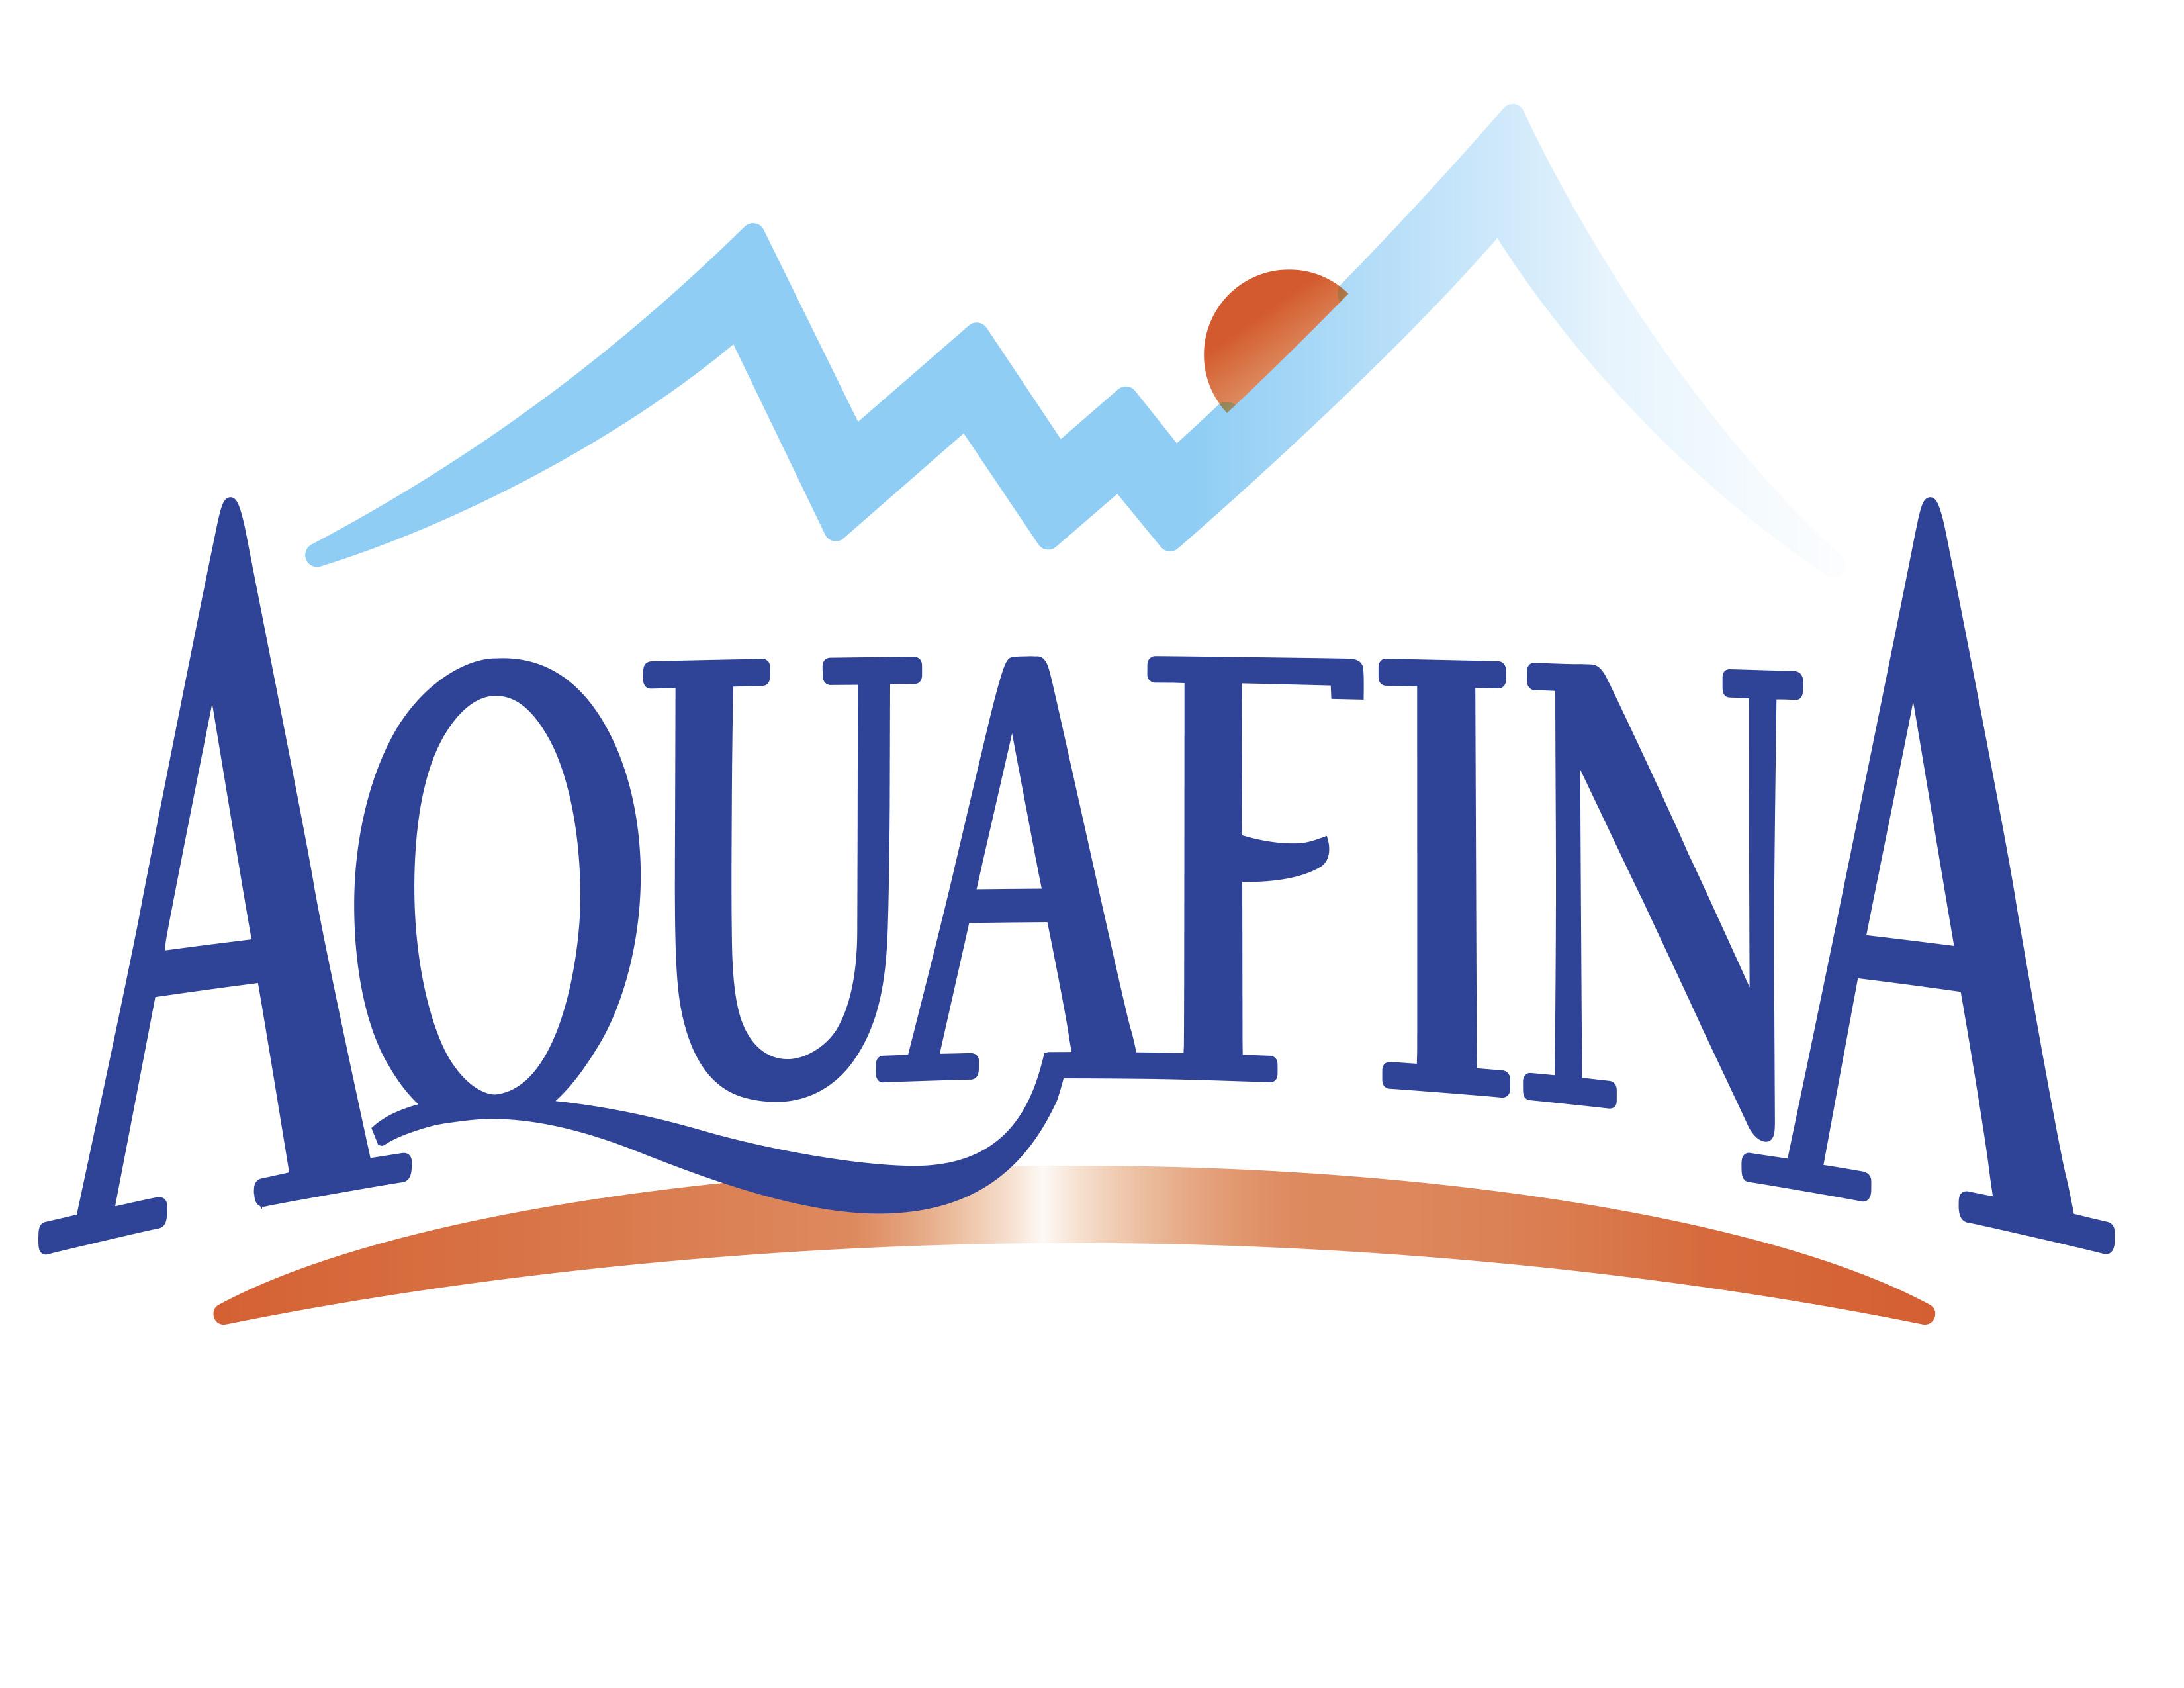 logo_Aquafina_2016.jpg - Logo Aquafina PNG